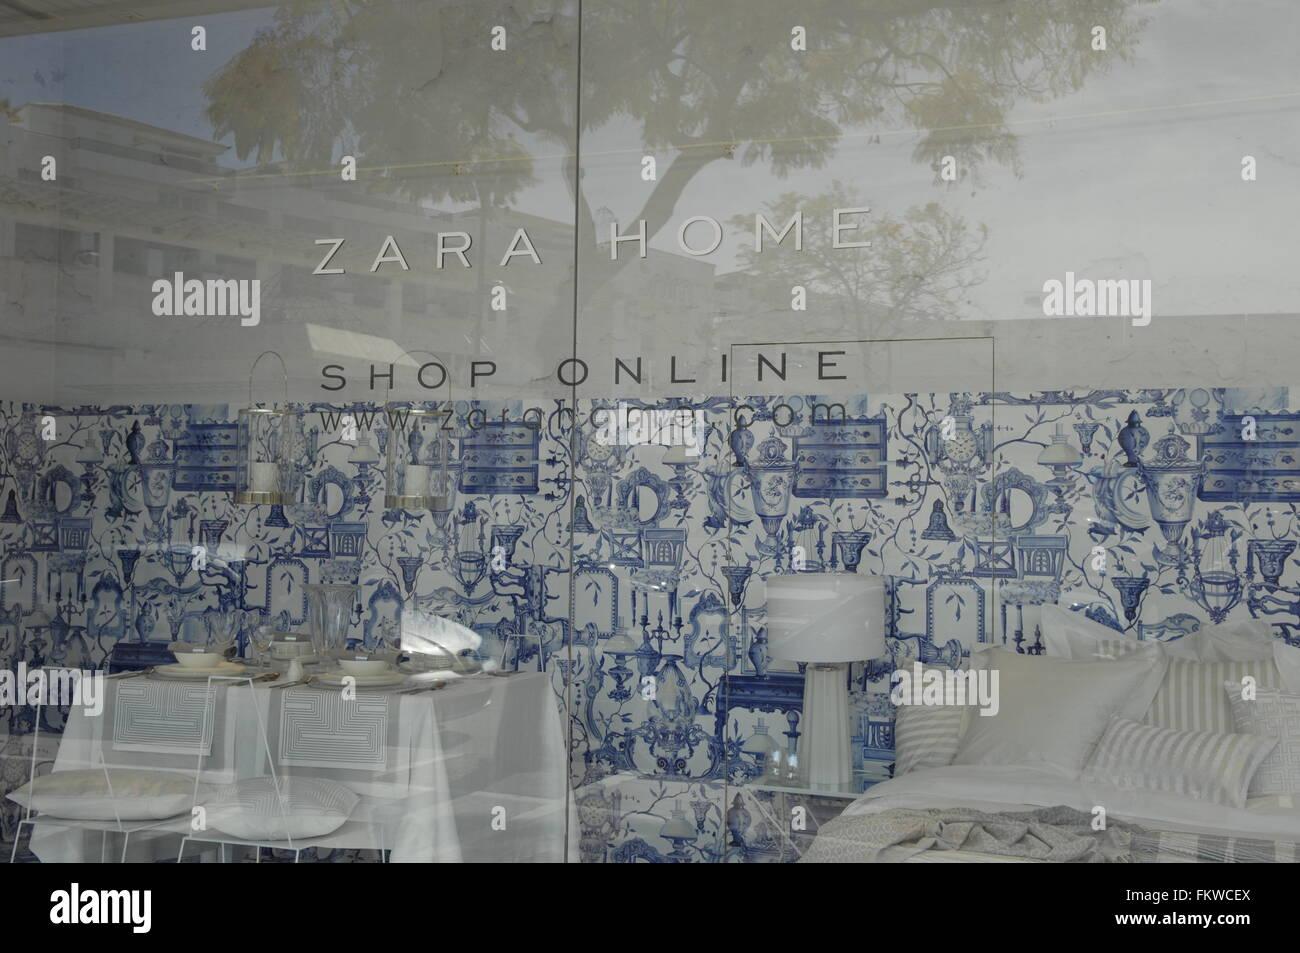 Zara Home Store Fenster In Puerto Banus Malaga Spanien Stockfoto